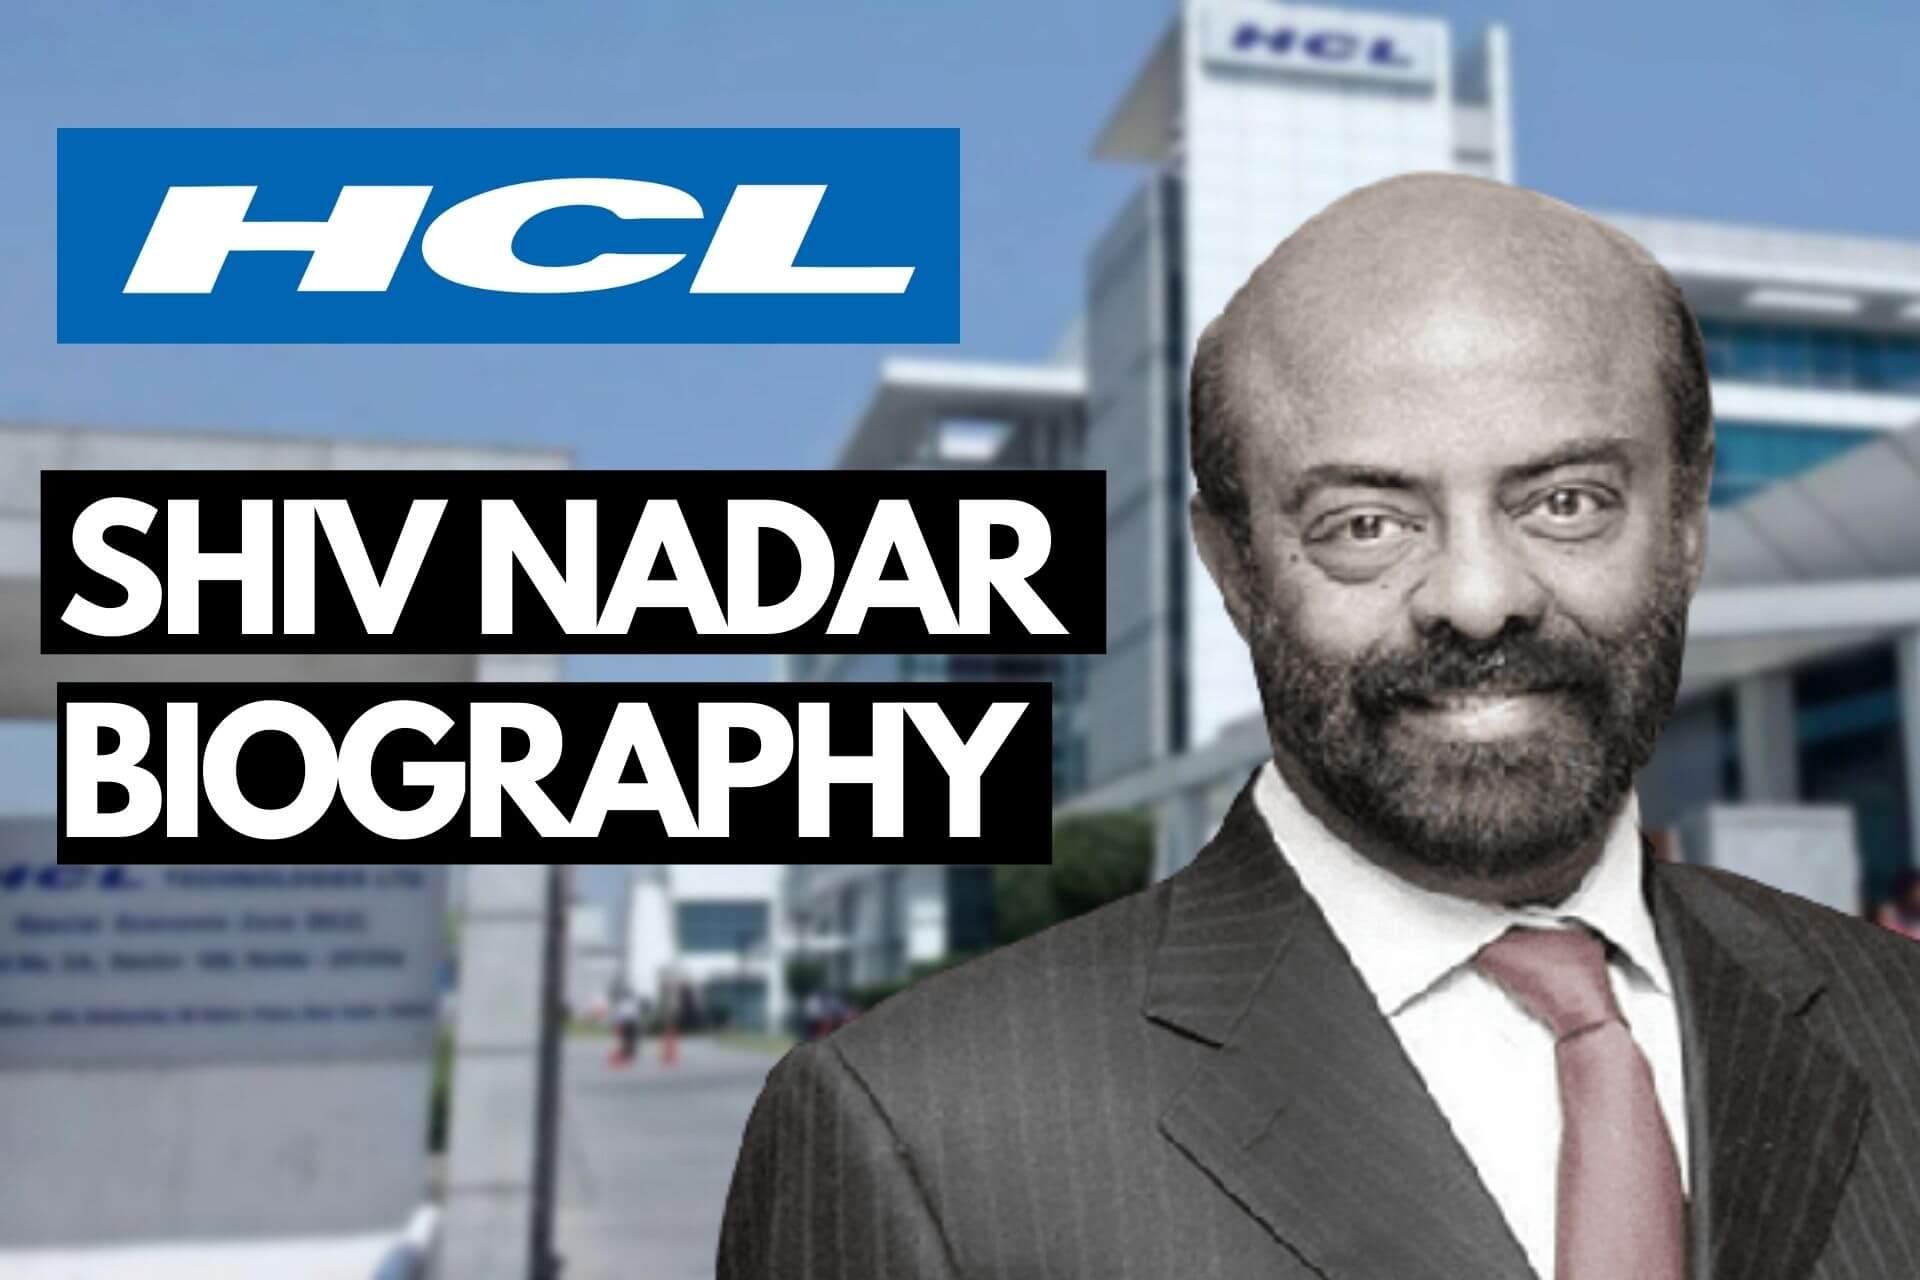 Shiv Nadar Biography – The Man Behind HCL Technologies' Success!